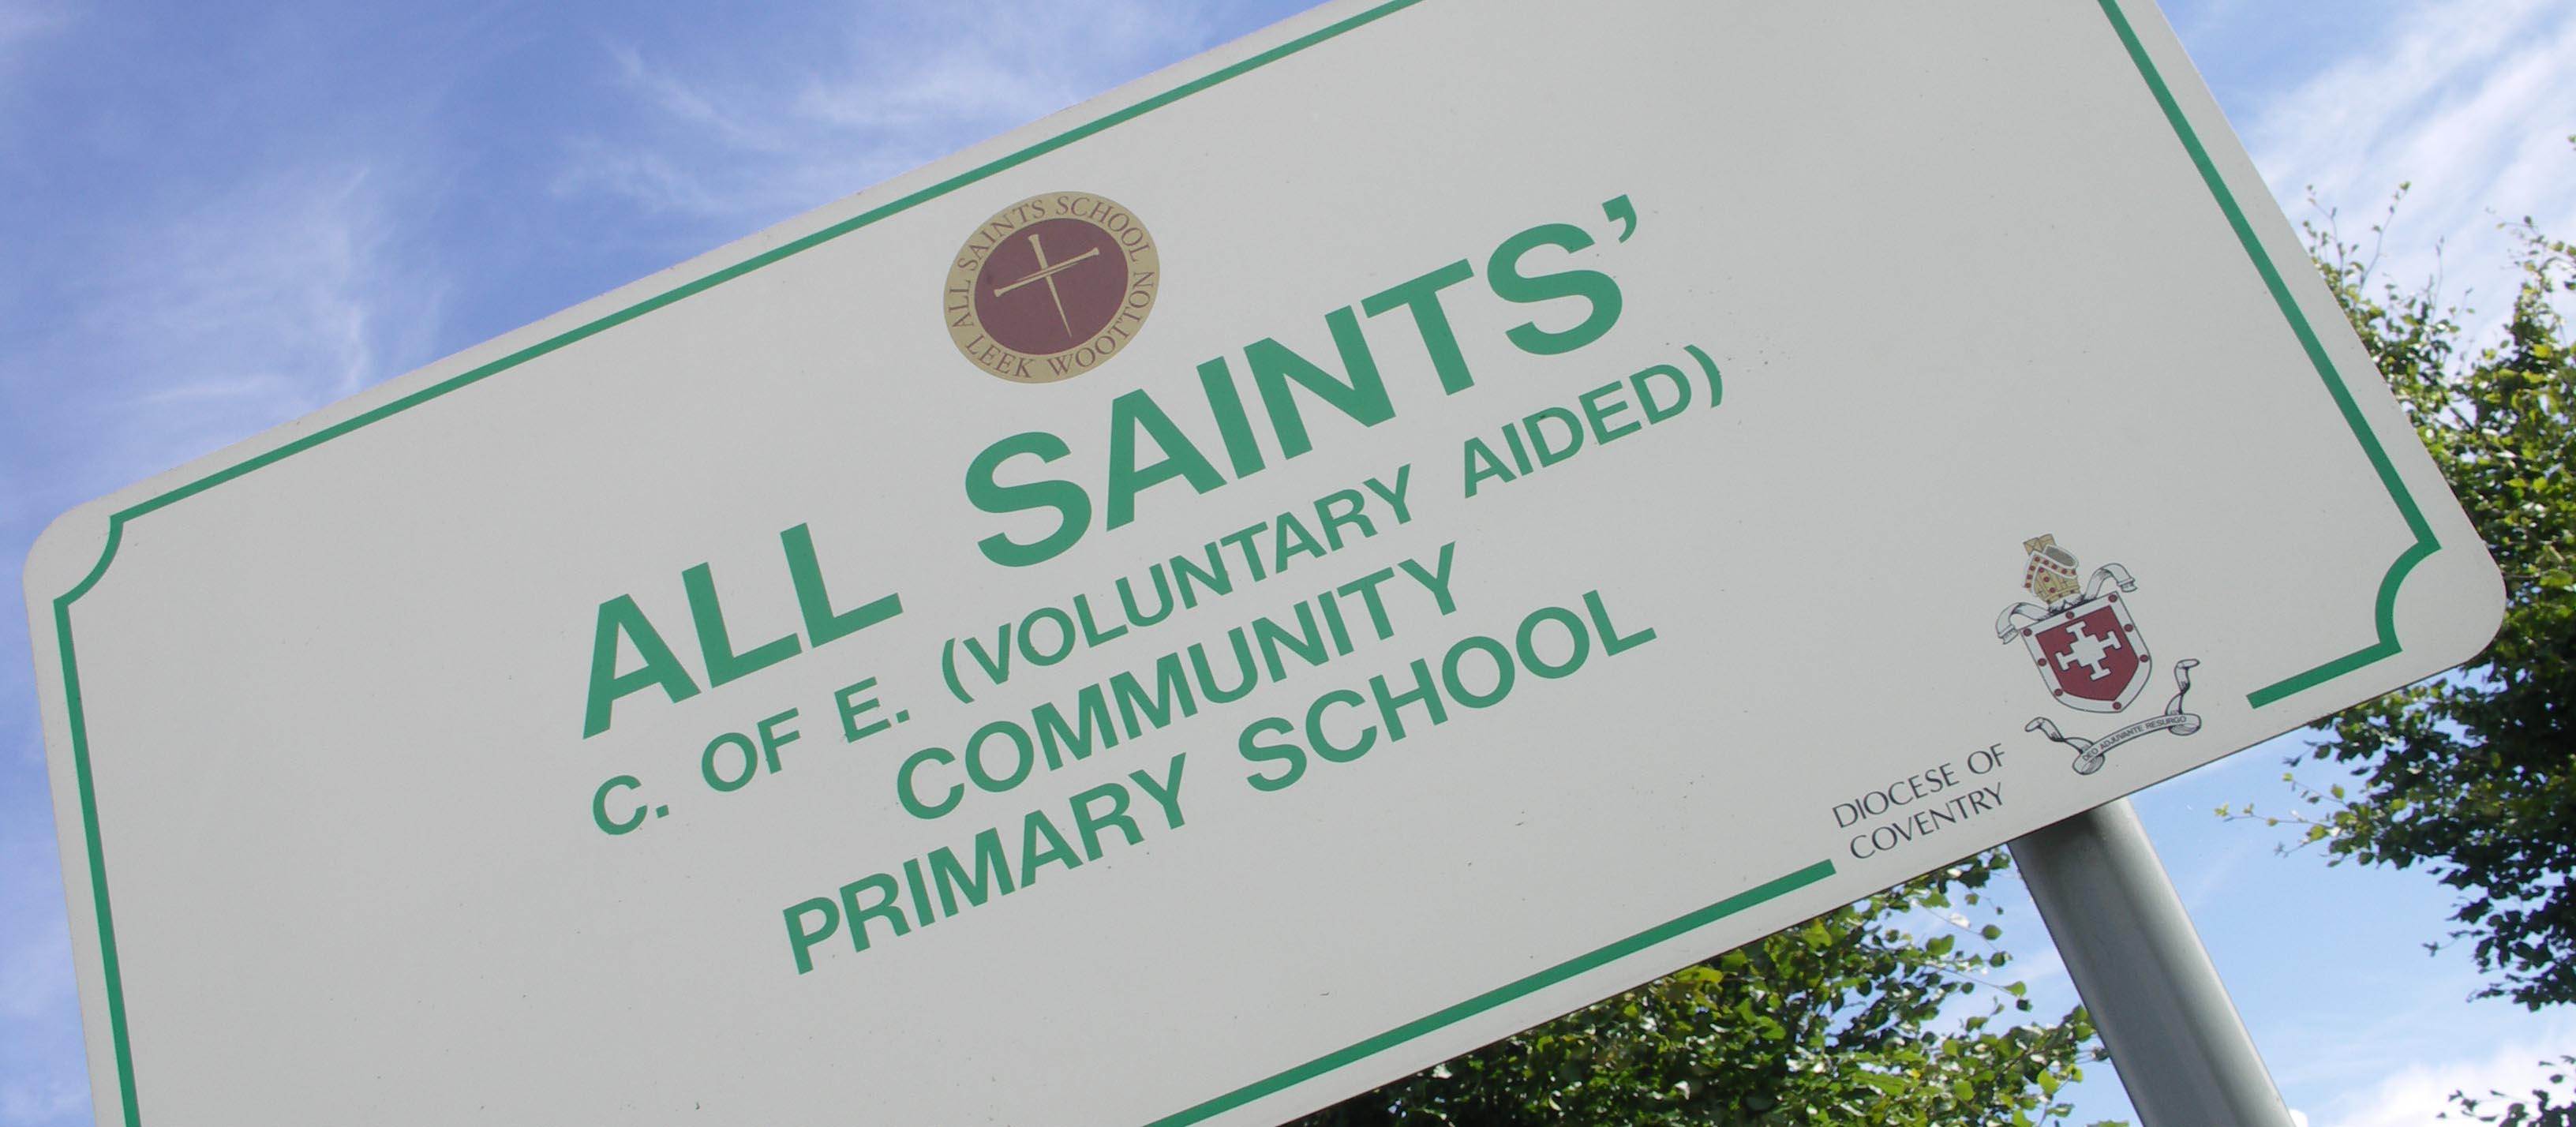 All Saints CE (VA) Community Primary School, Leek Wootton